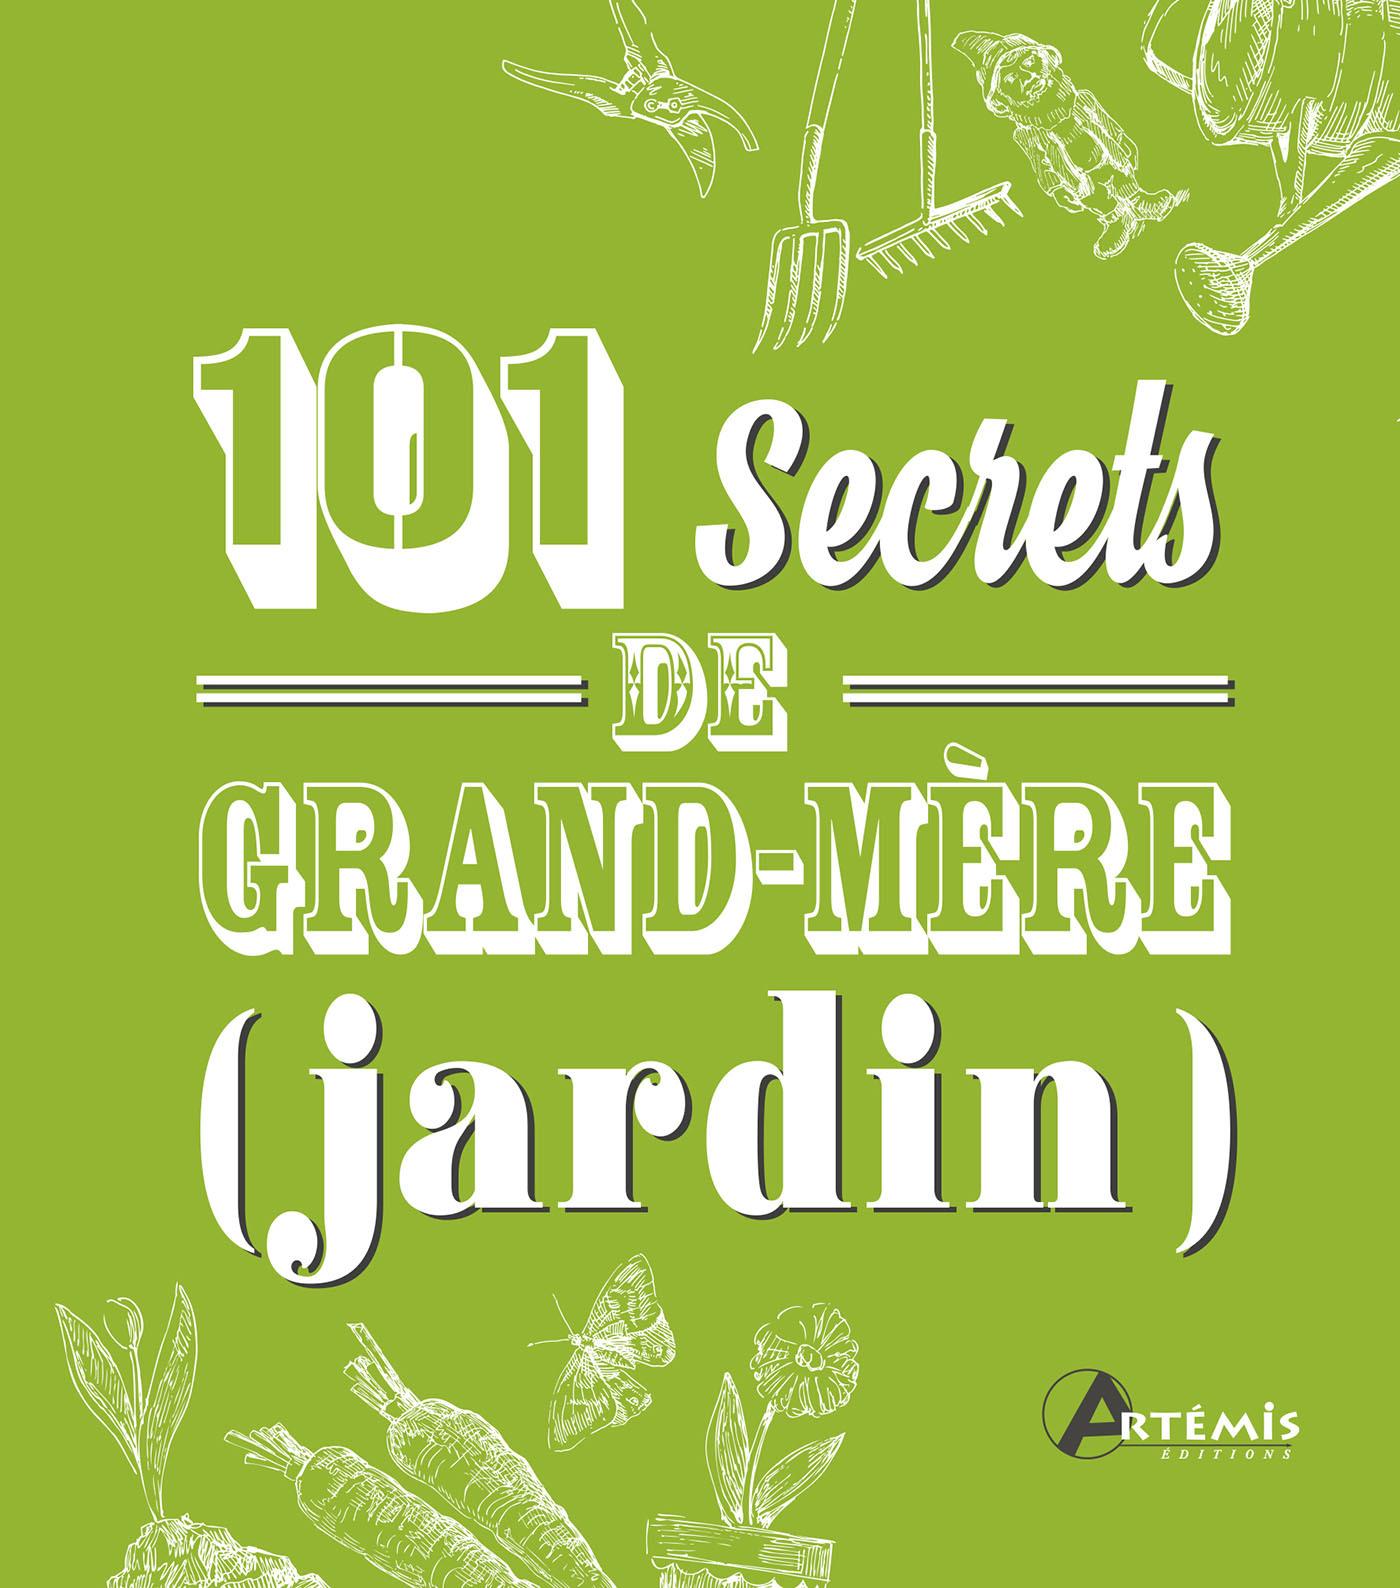 101 SECRETS DE GRAND-MERE JARDIN